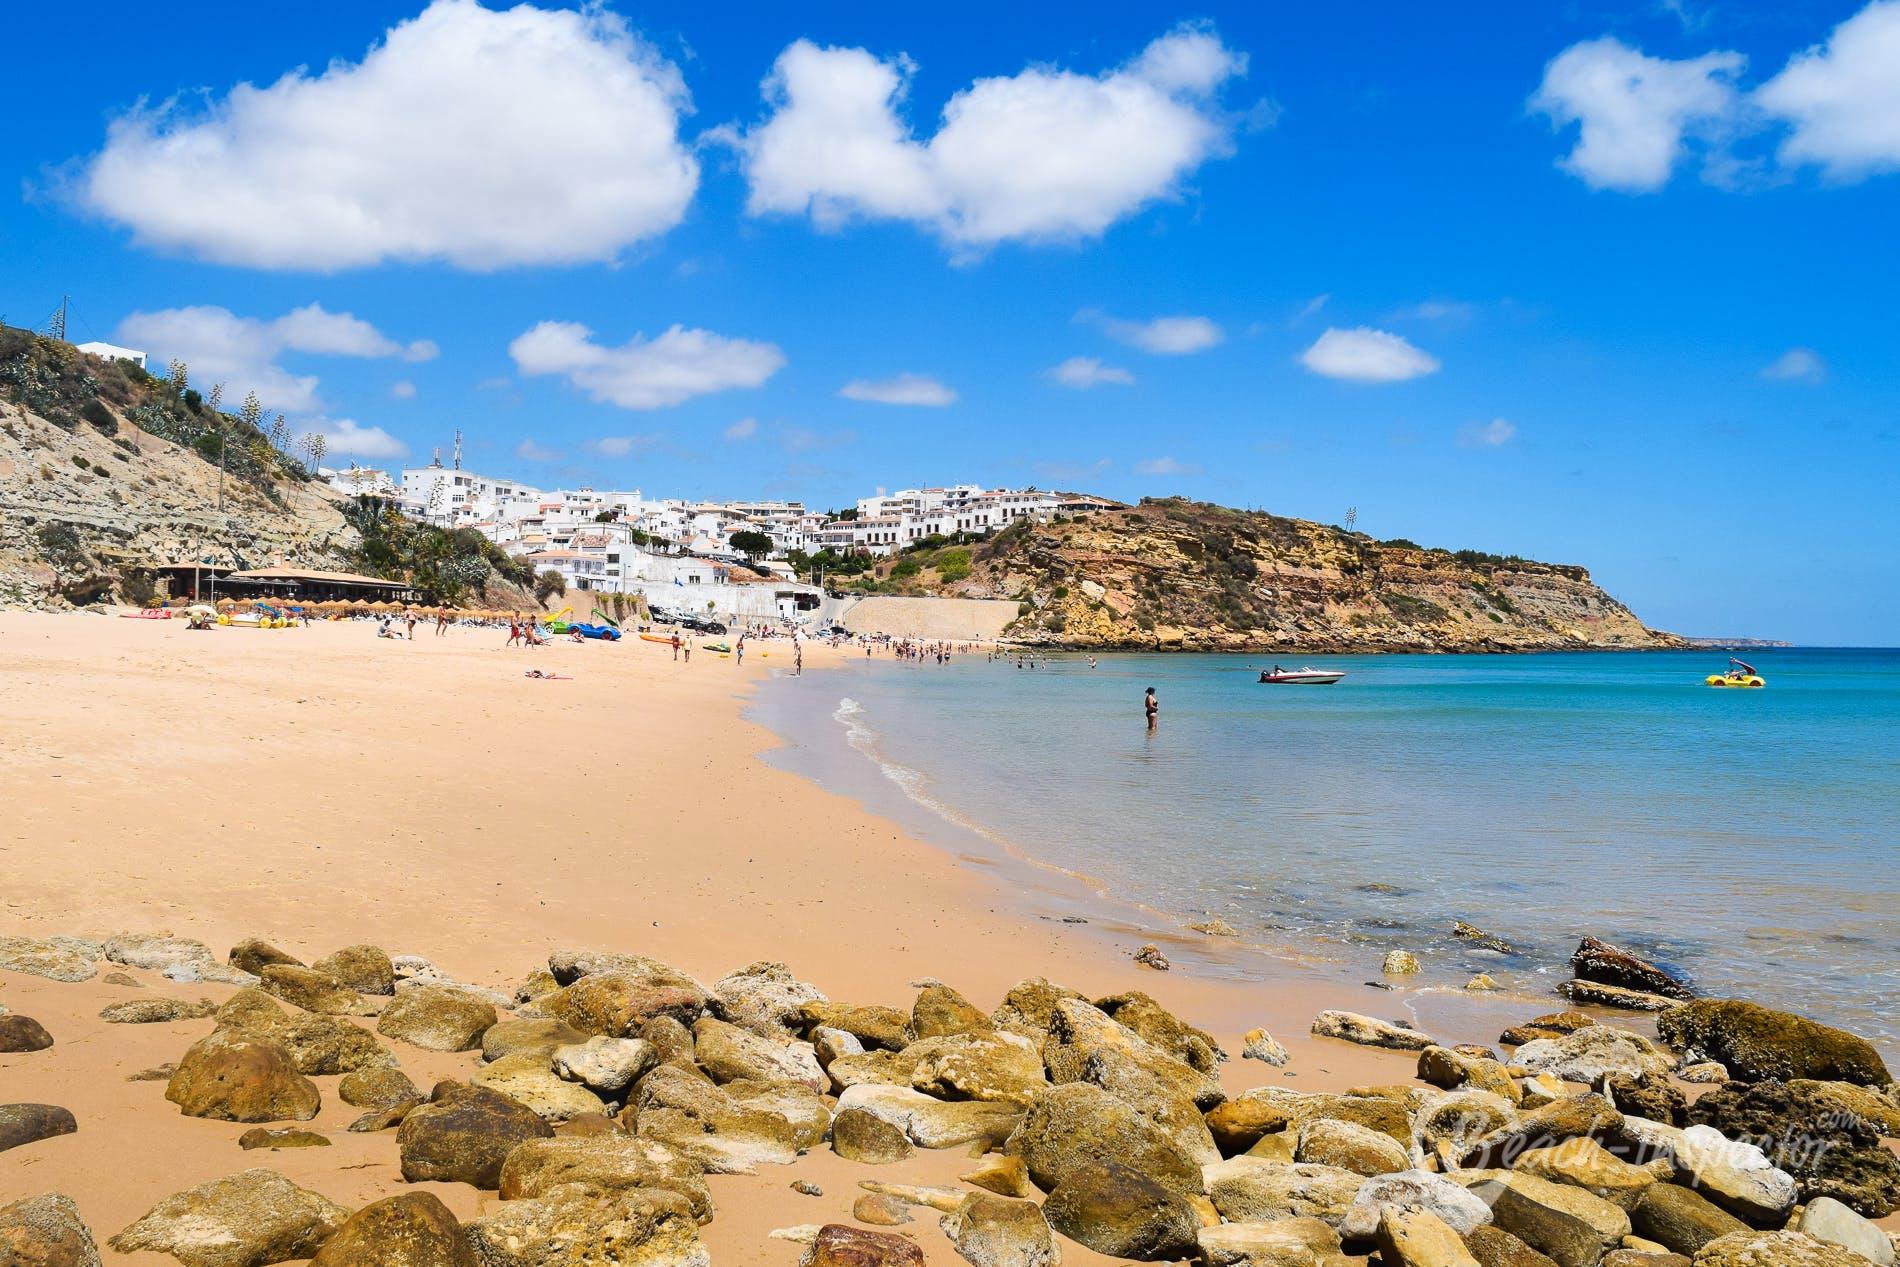 Strand Praia do Burgau, Algarve, Portugal